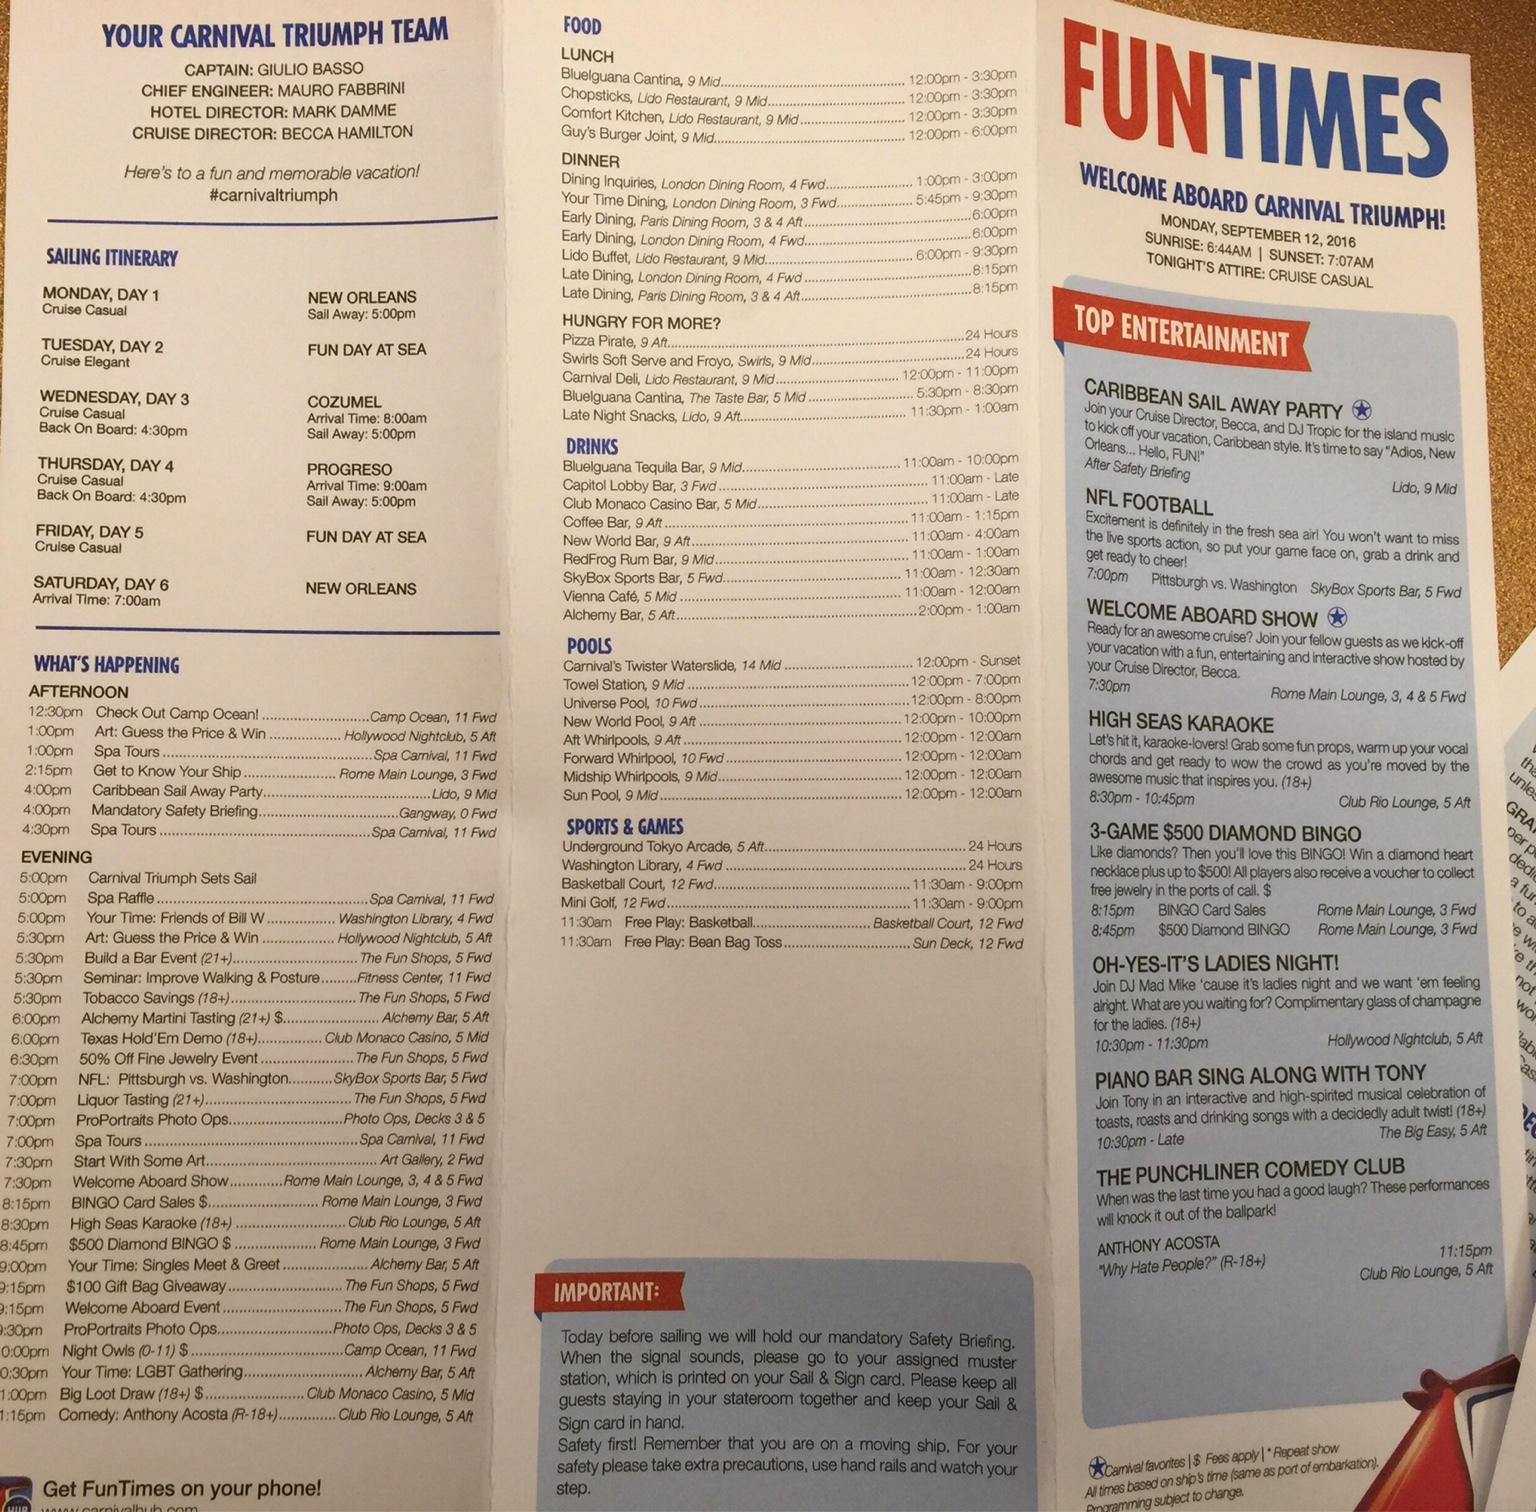 Carnival Triumph 5 Day Fun Times 9 12 9 17 Cruise